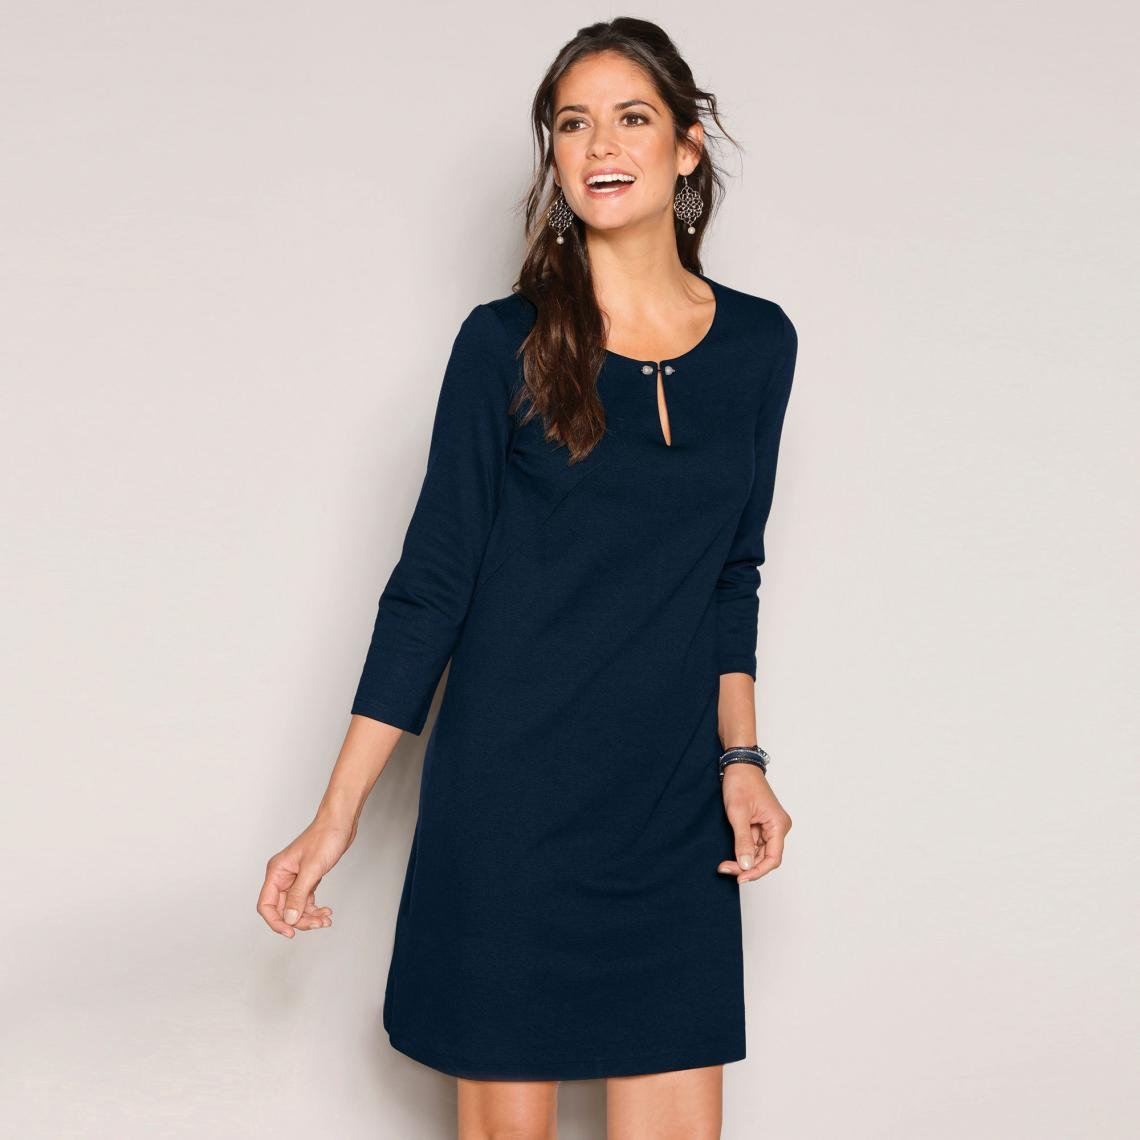 1472ad61fa1 Robe courte col caftan manches 3 4 ouverture dos femme - Bleu Marine 3  SUISSES